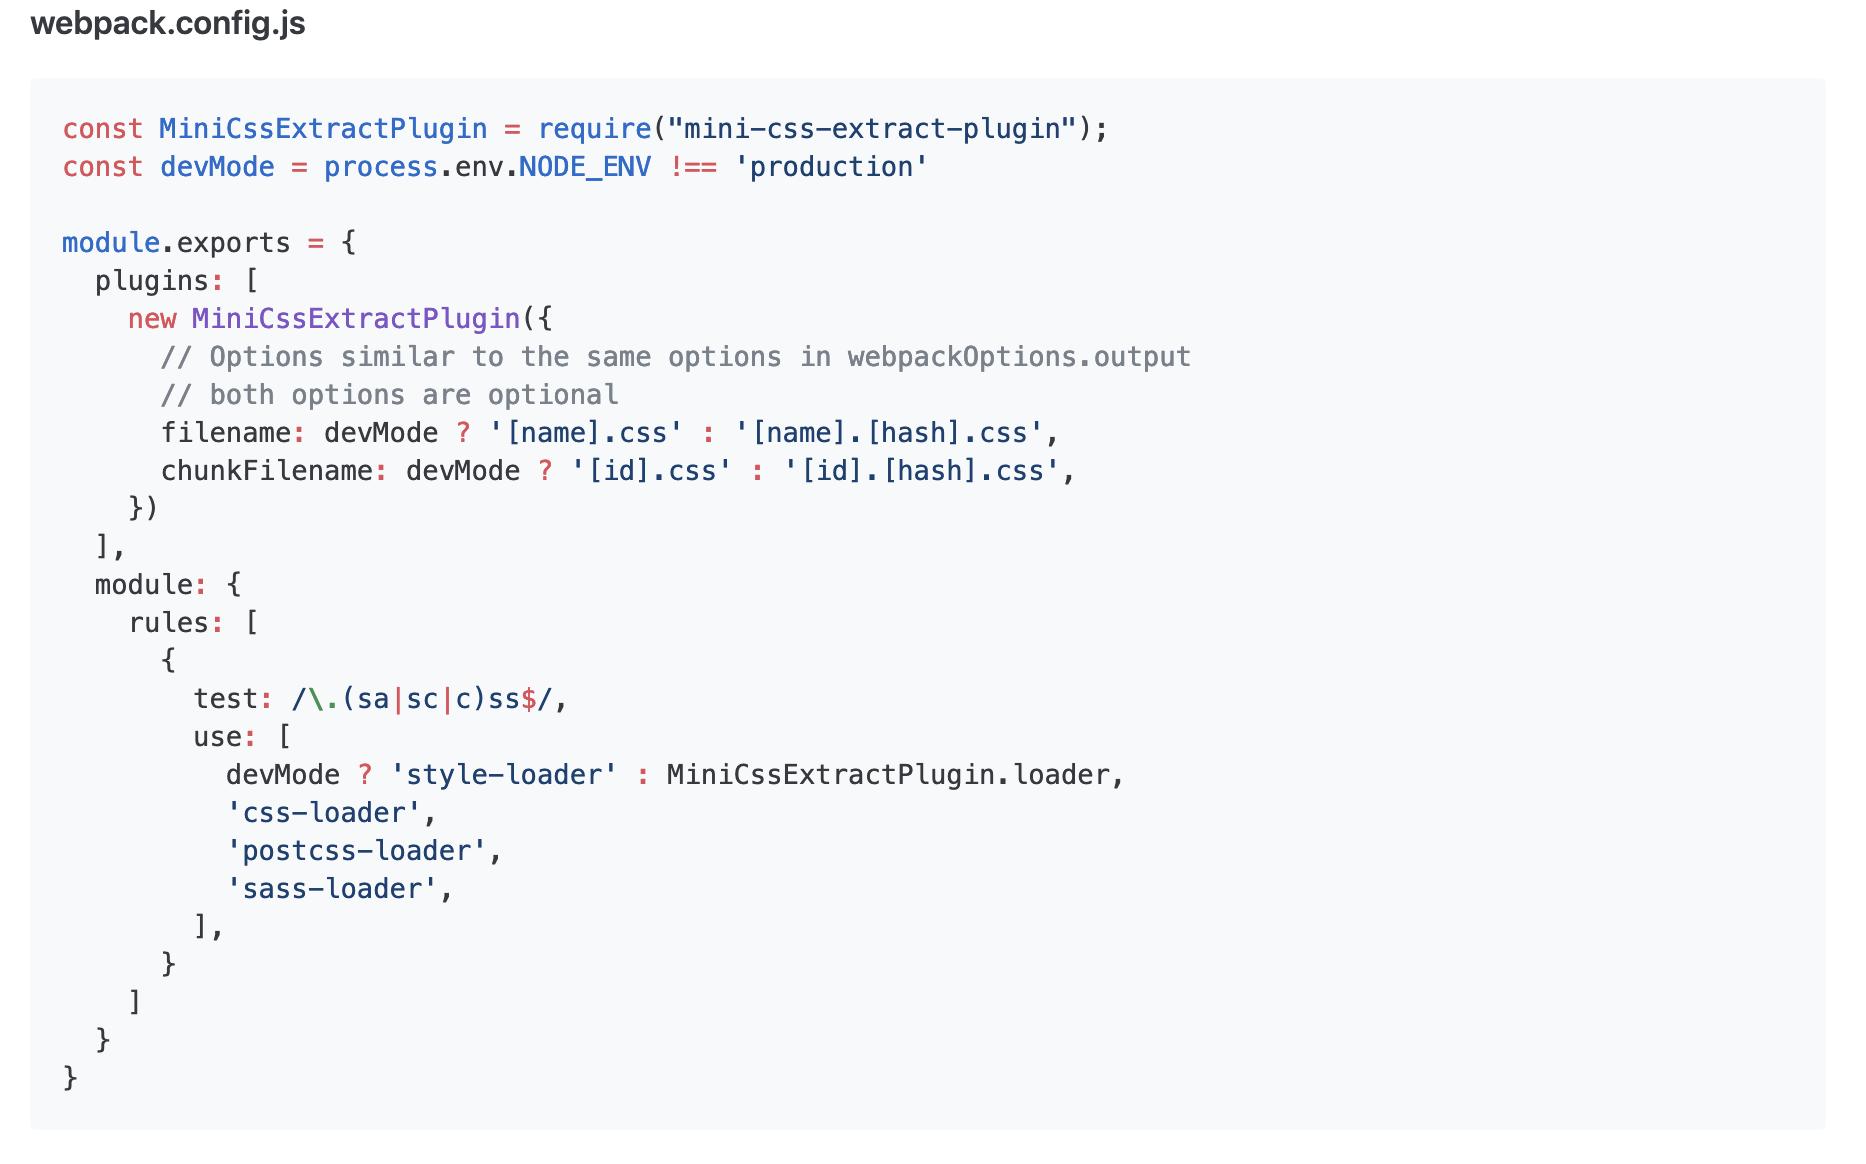 Module build failed: Syntax Error (5:1) Unknown word · Issue